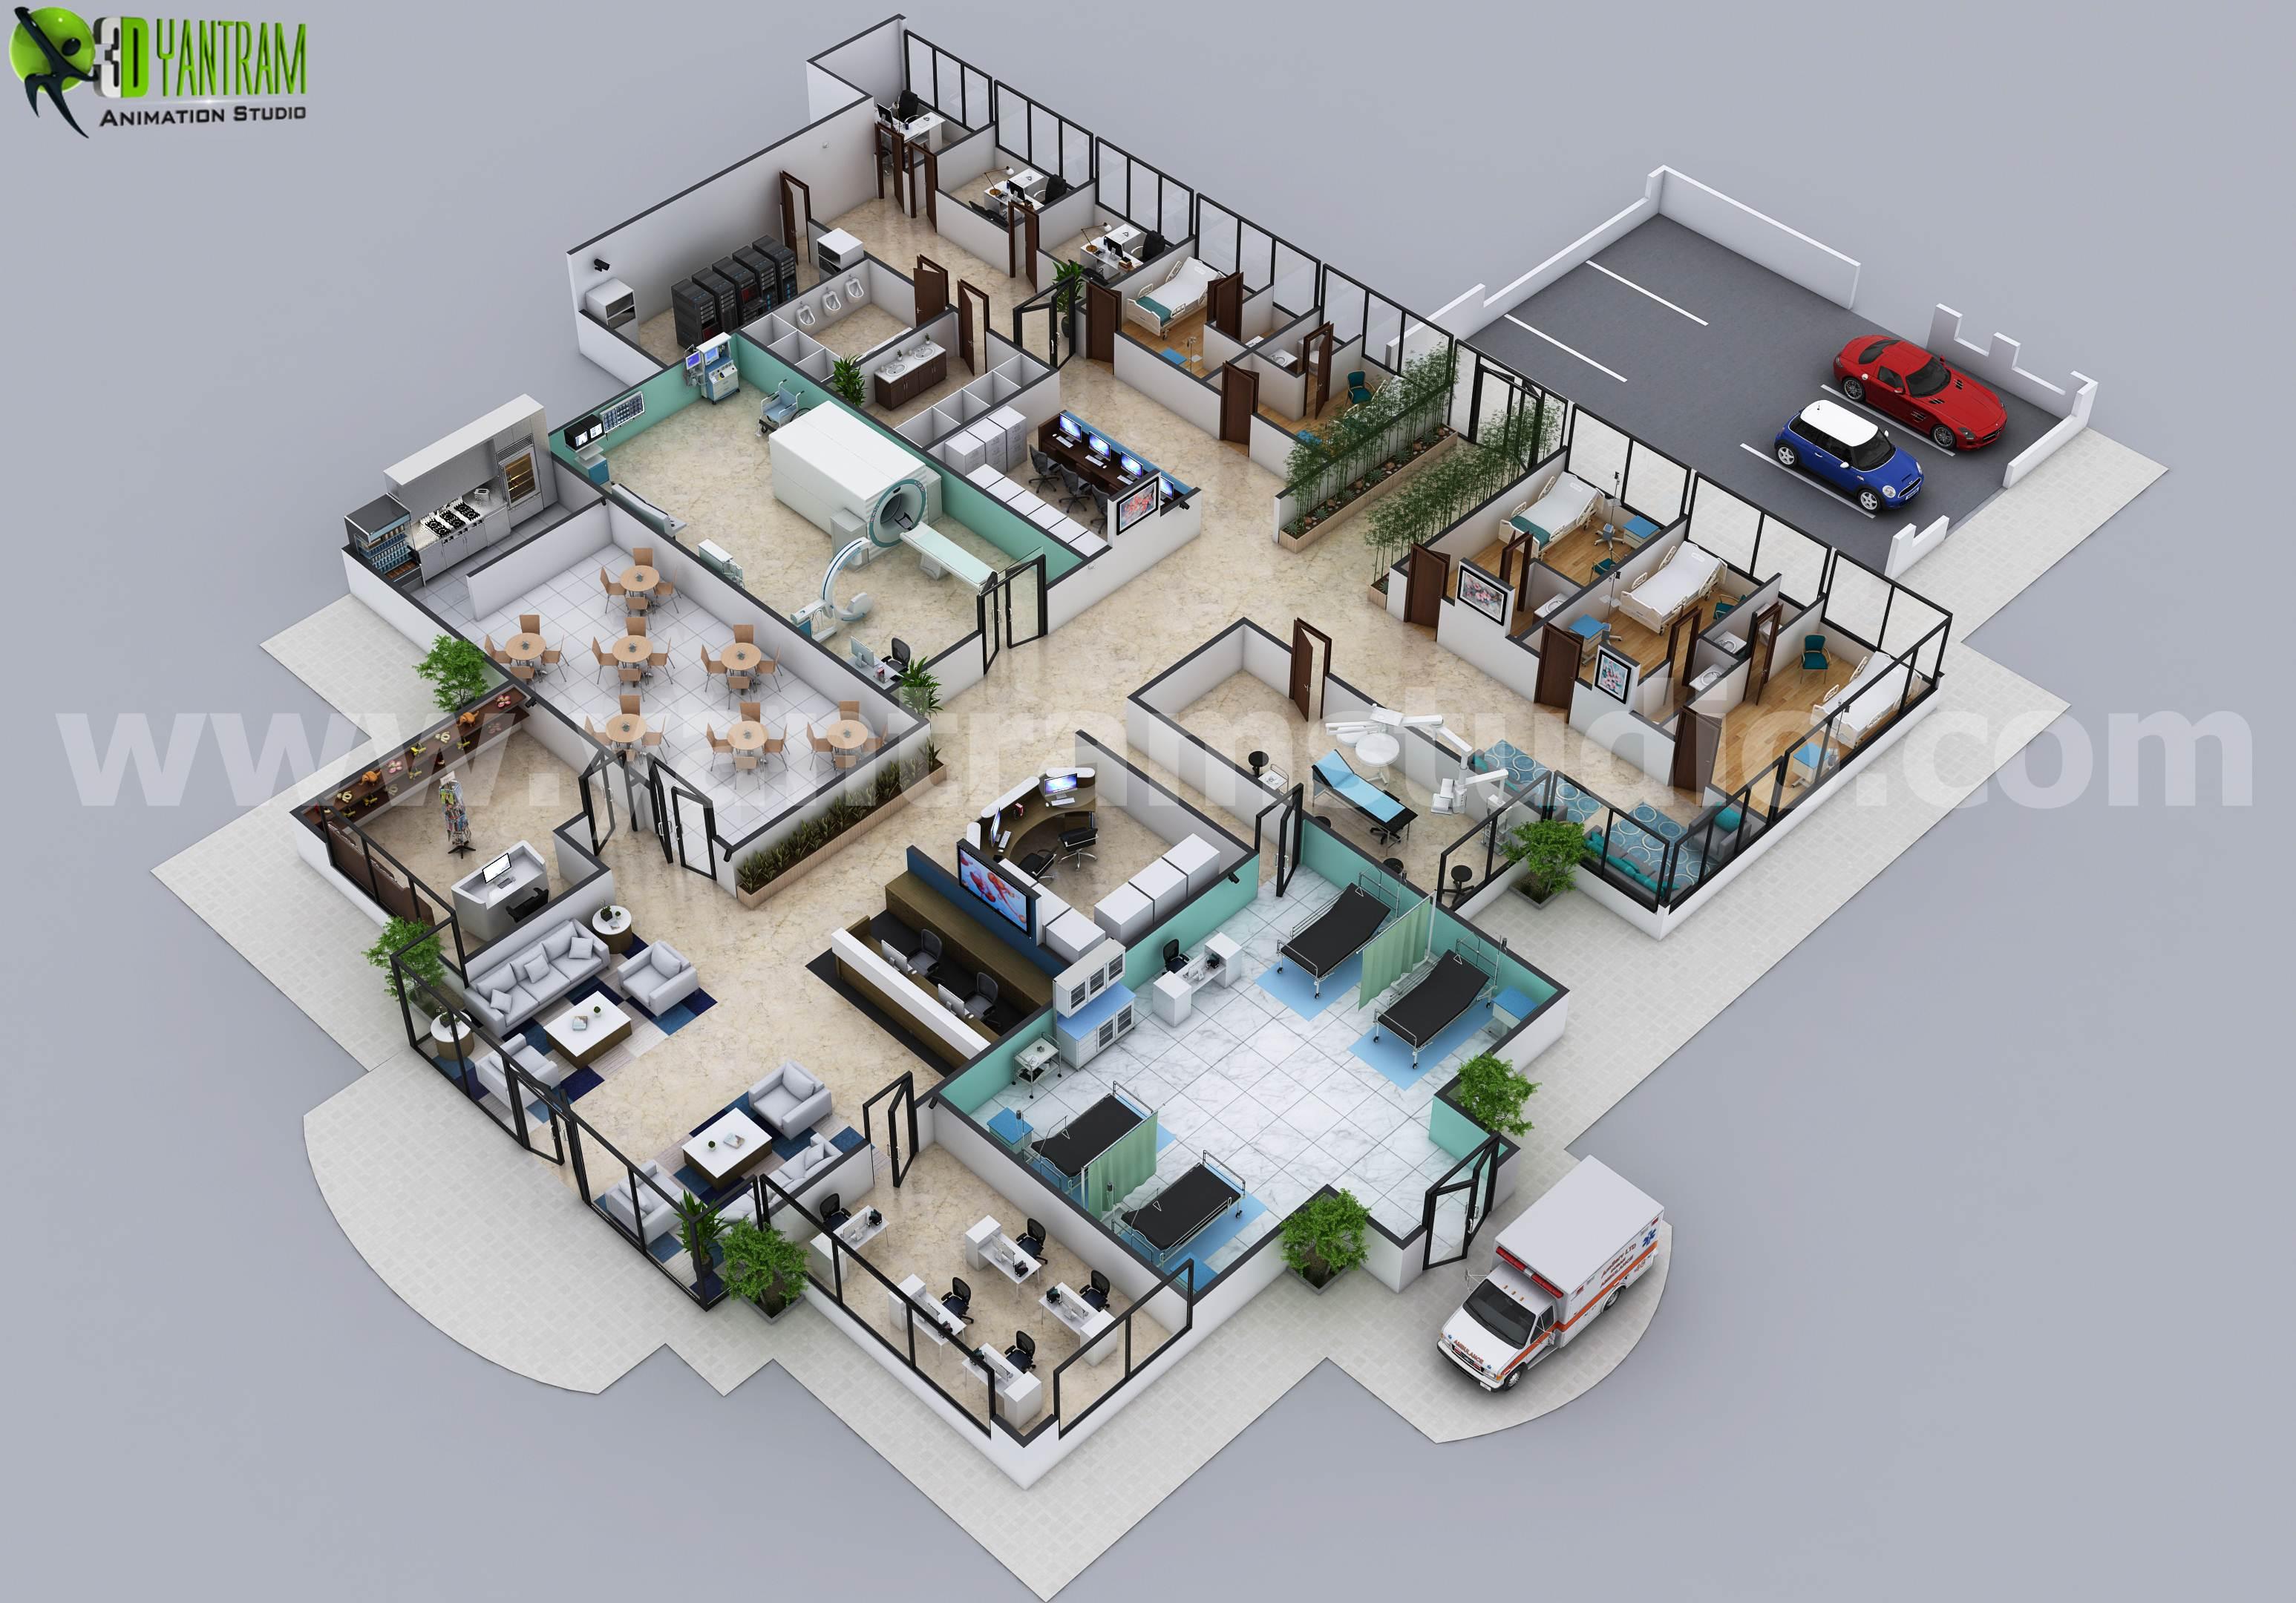 3d hospital floor plan layout design by yantram 3d floor plan software chicago usa hospital